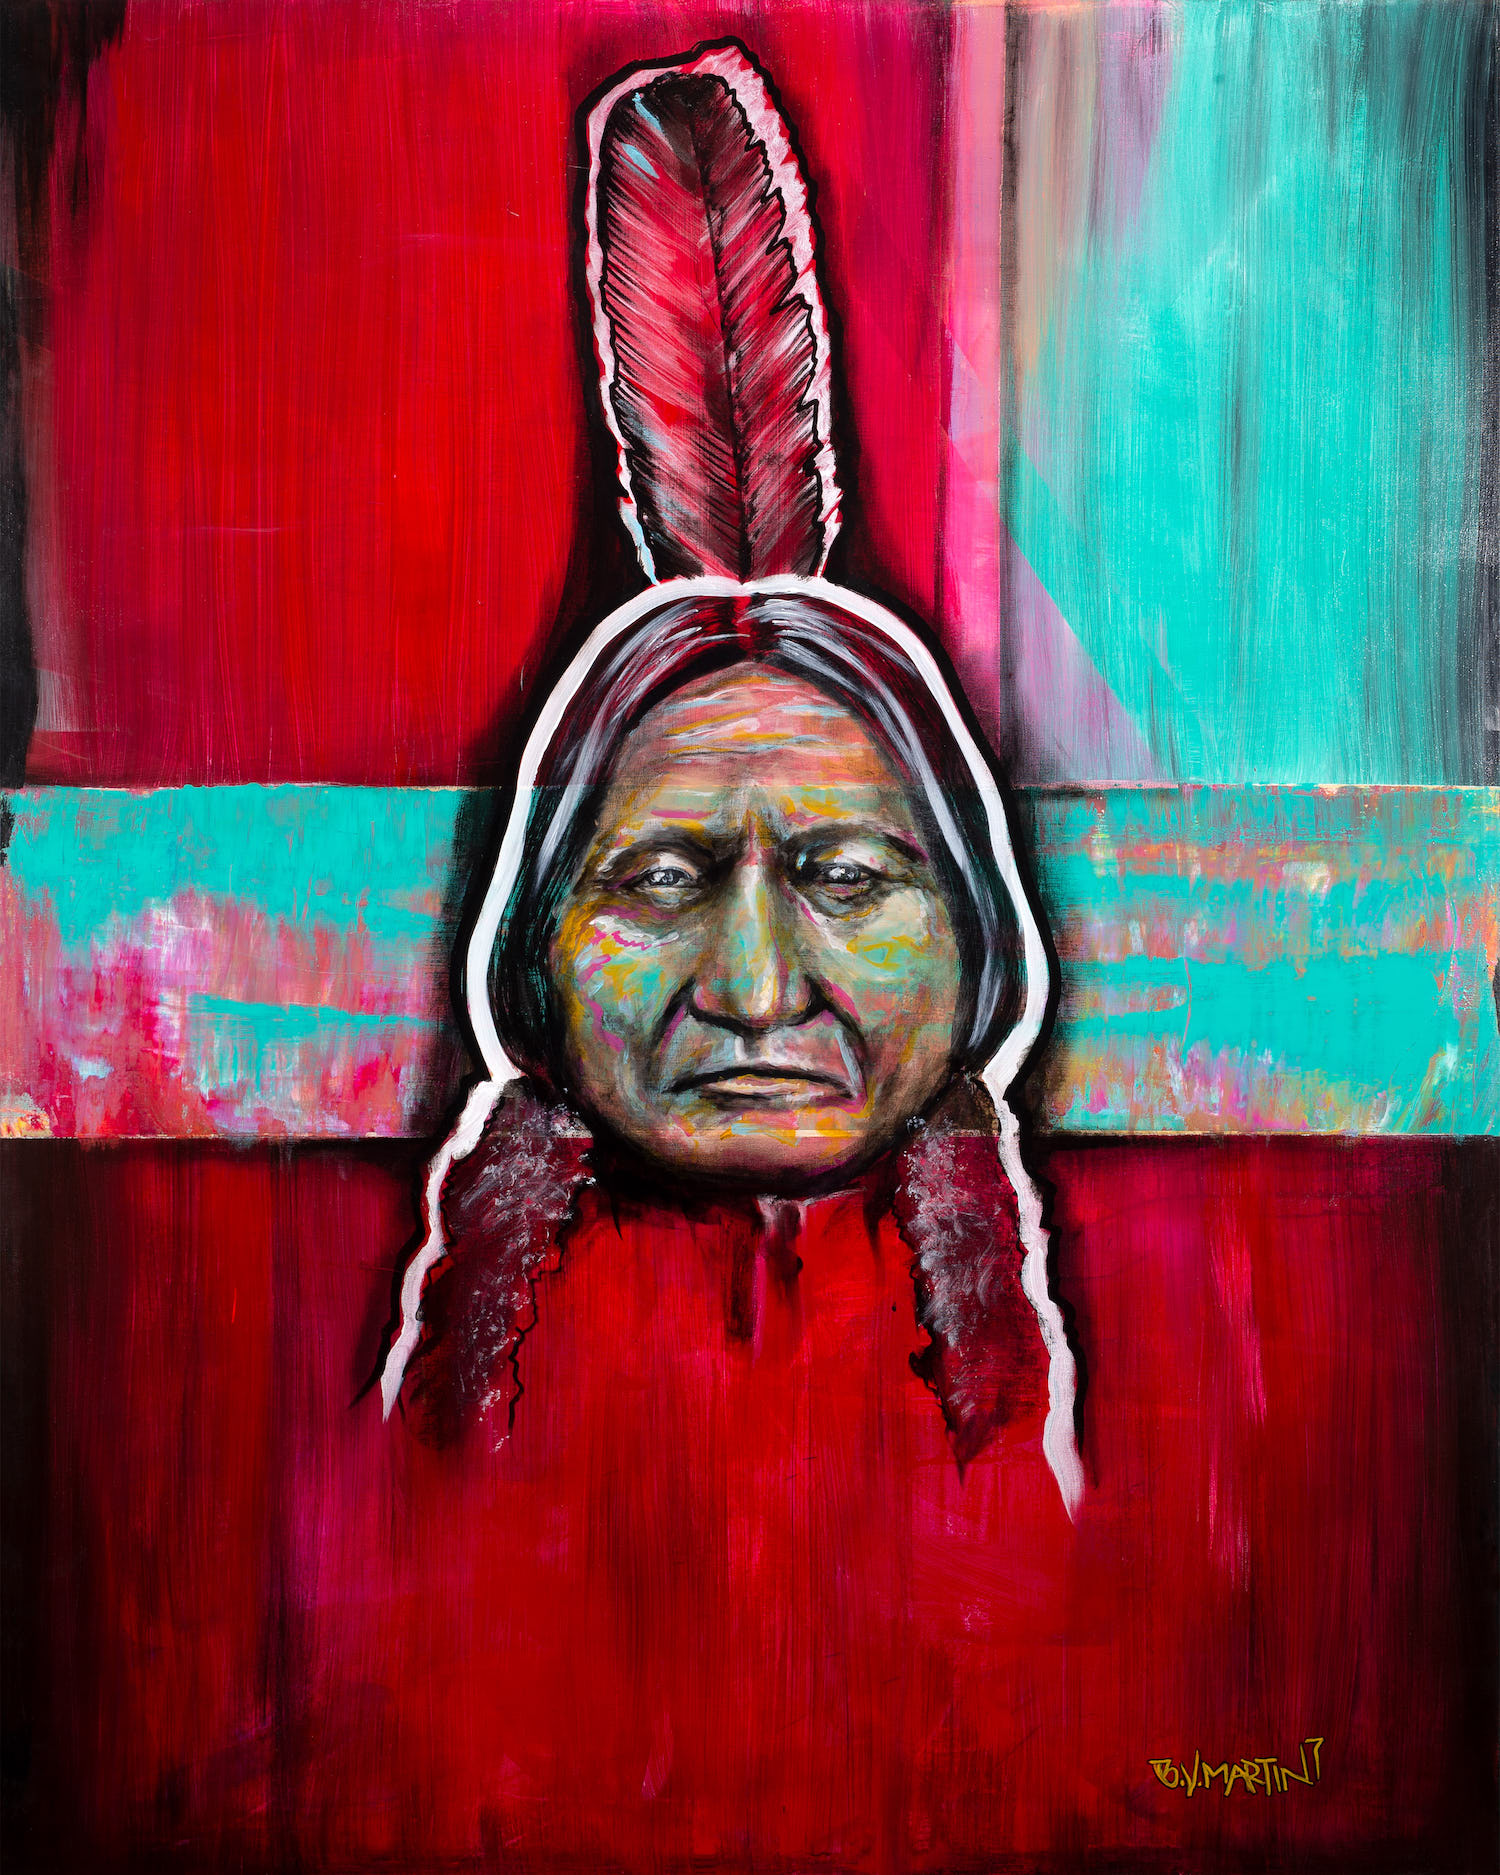 Art Photography Fresno California - Photo of Indian Art Painting